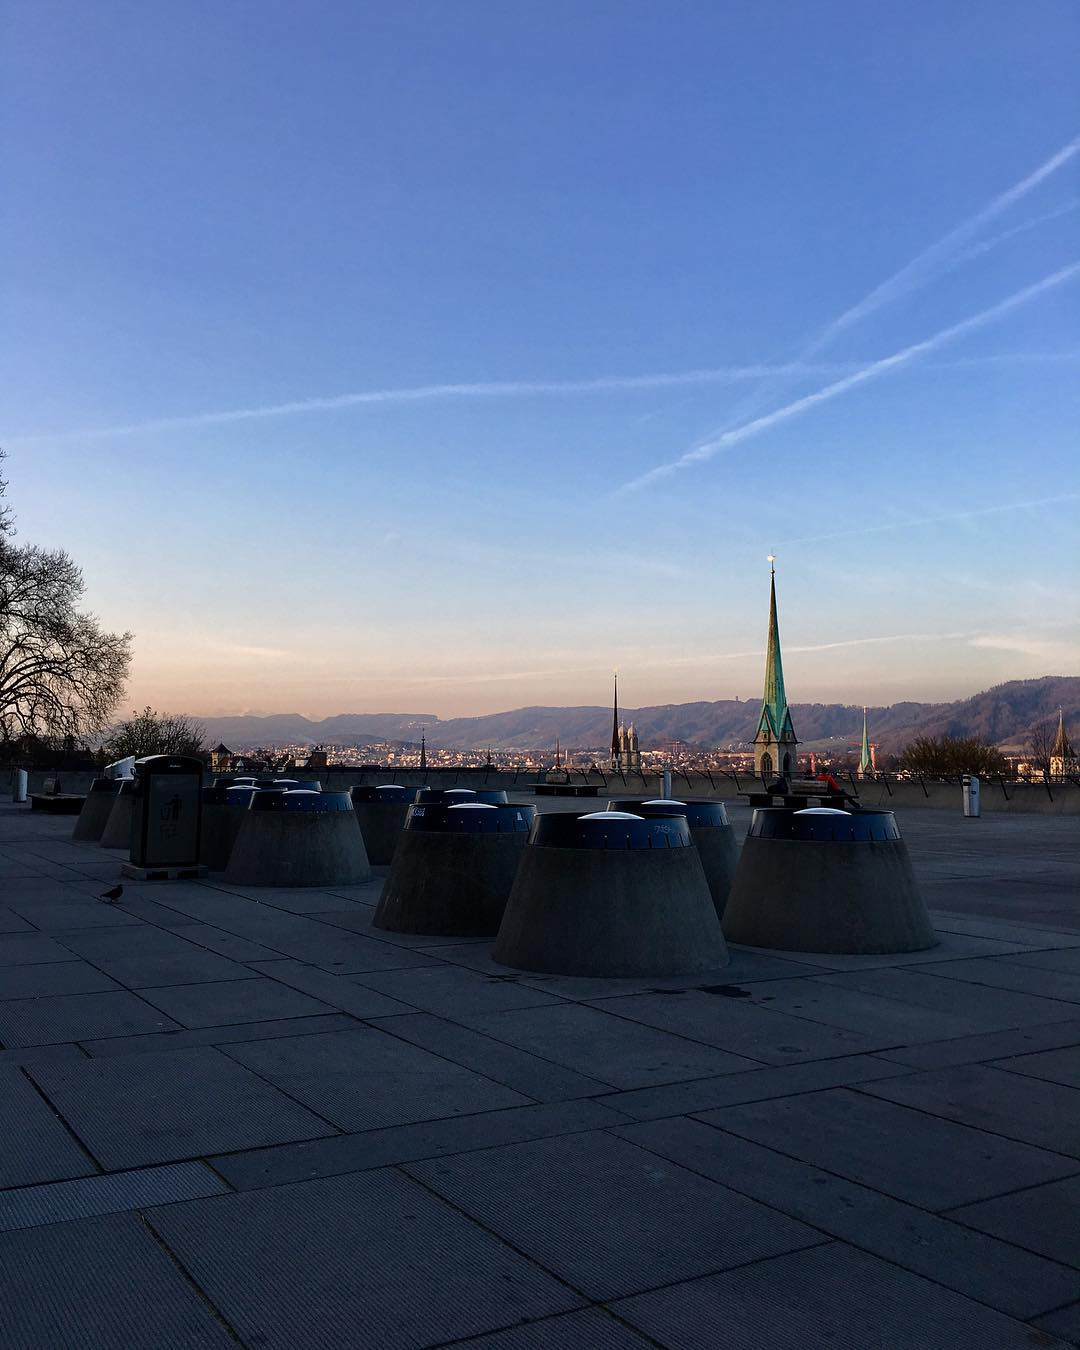 Image from instagram by Flavia   24   Zürich